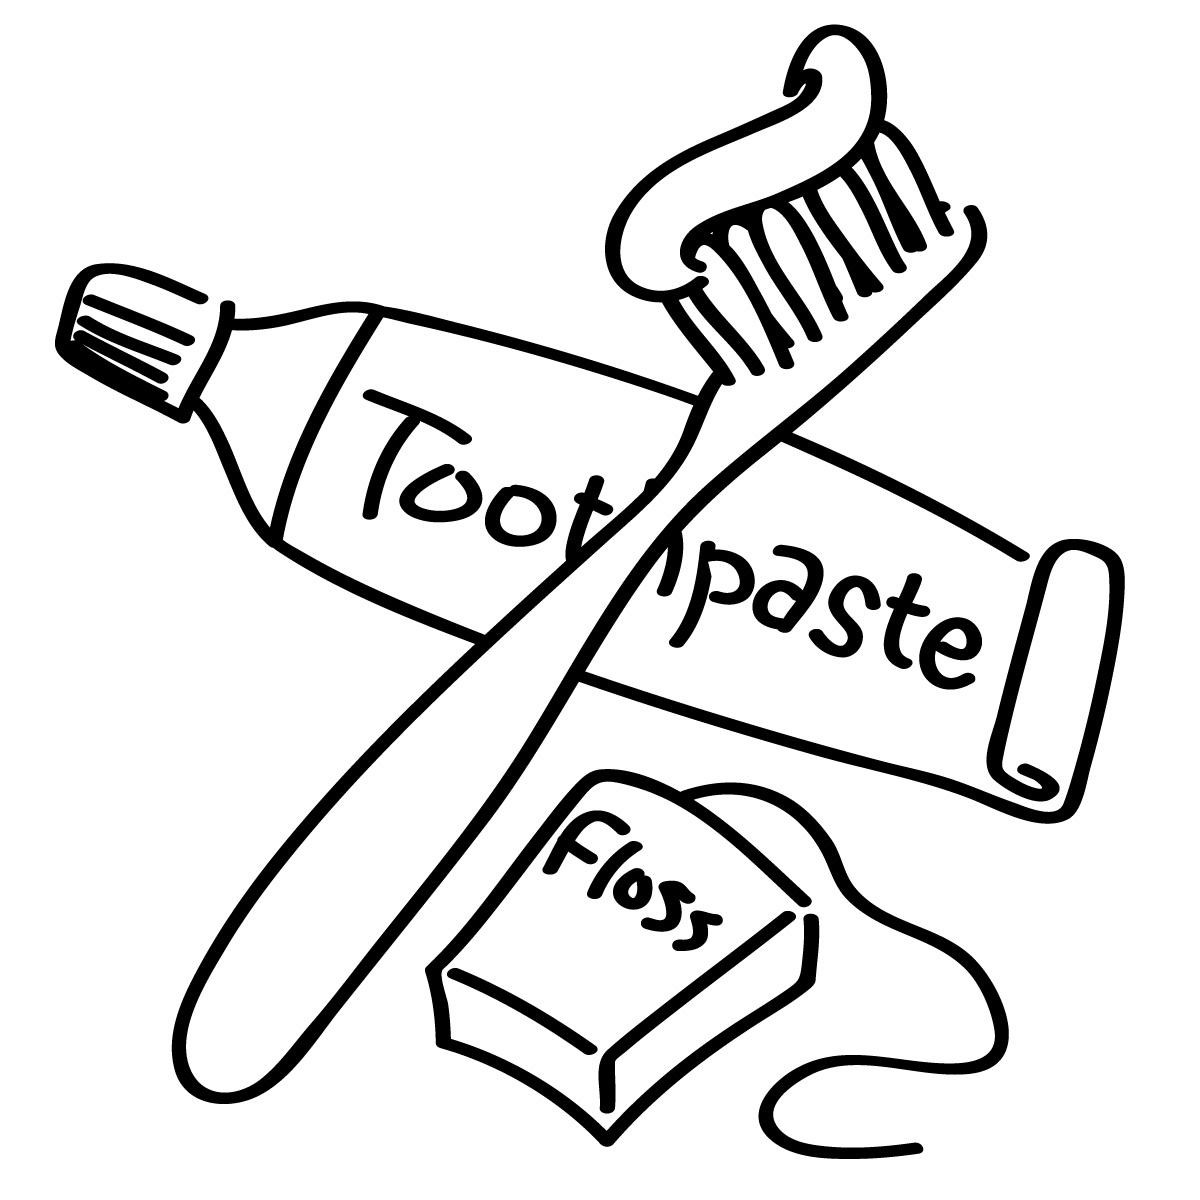 Hygiene Clipart.